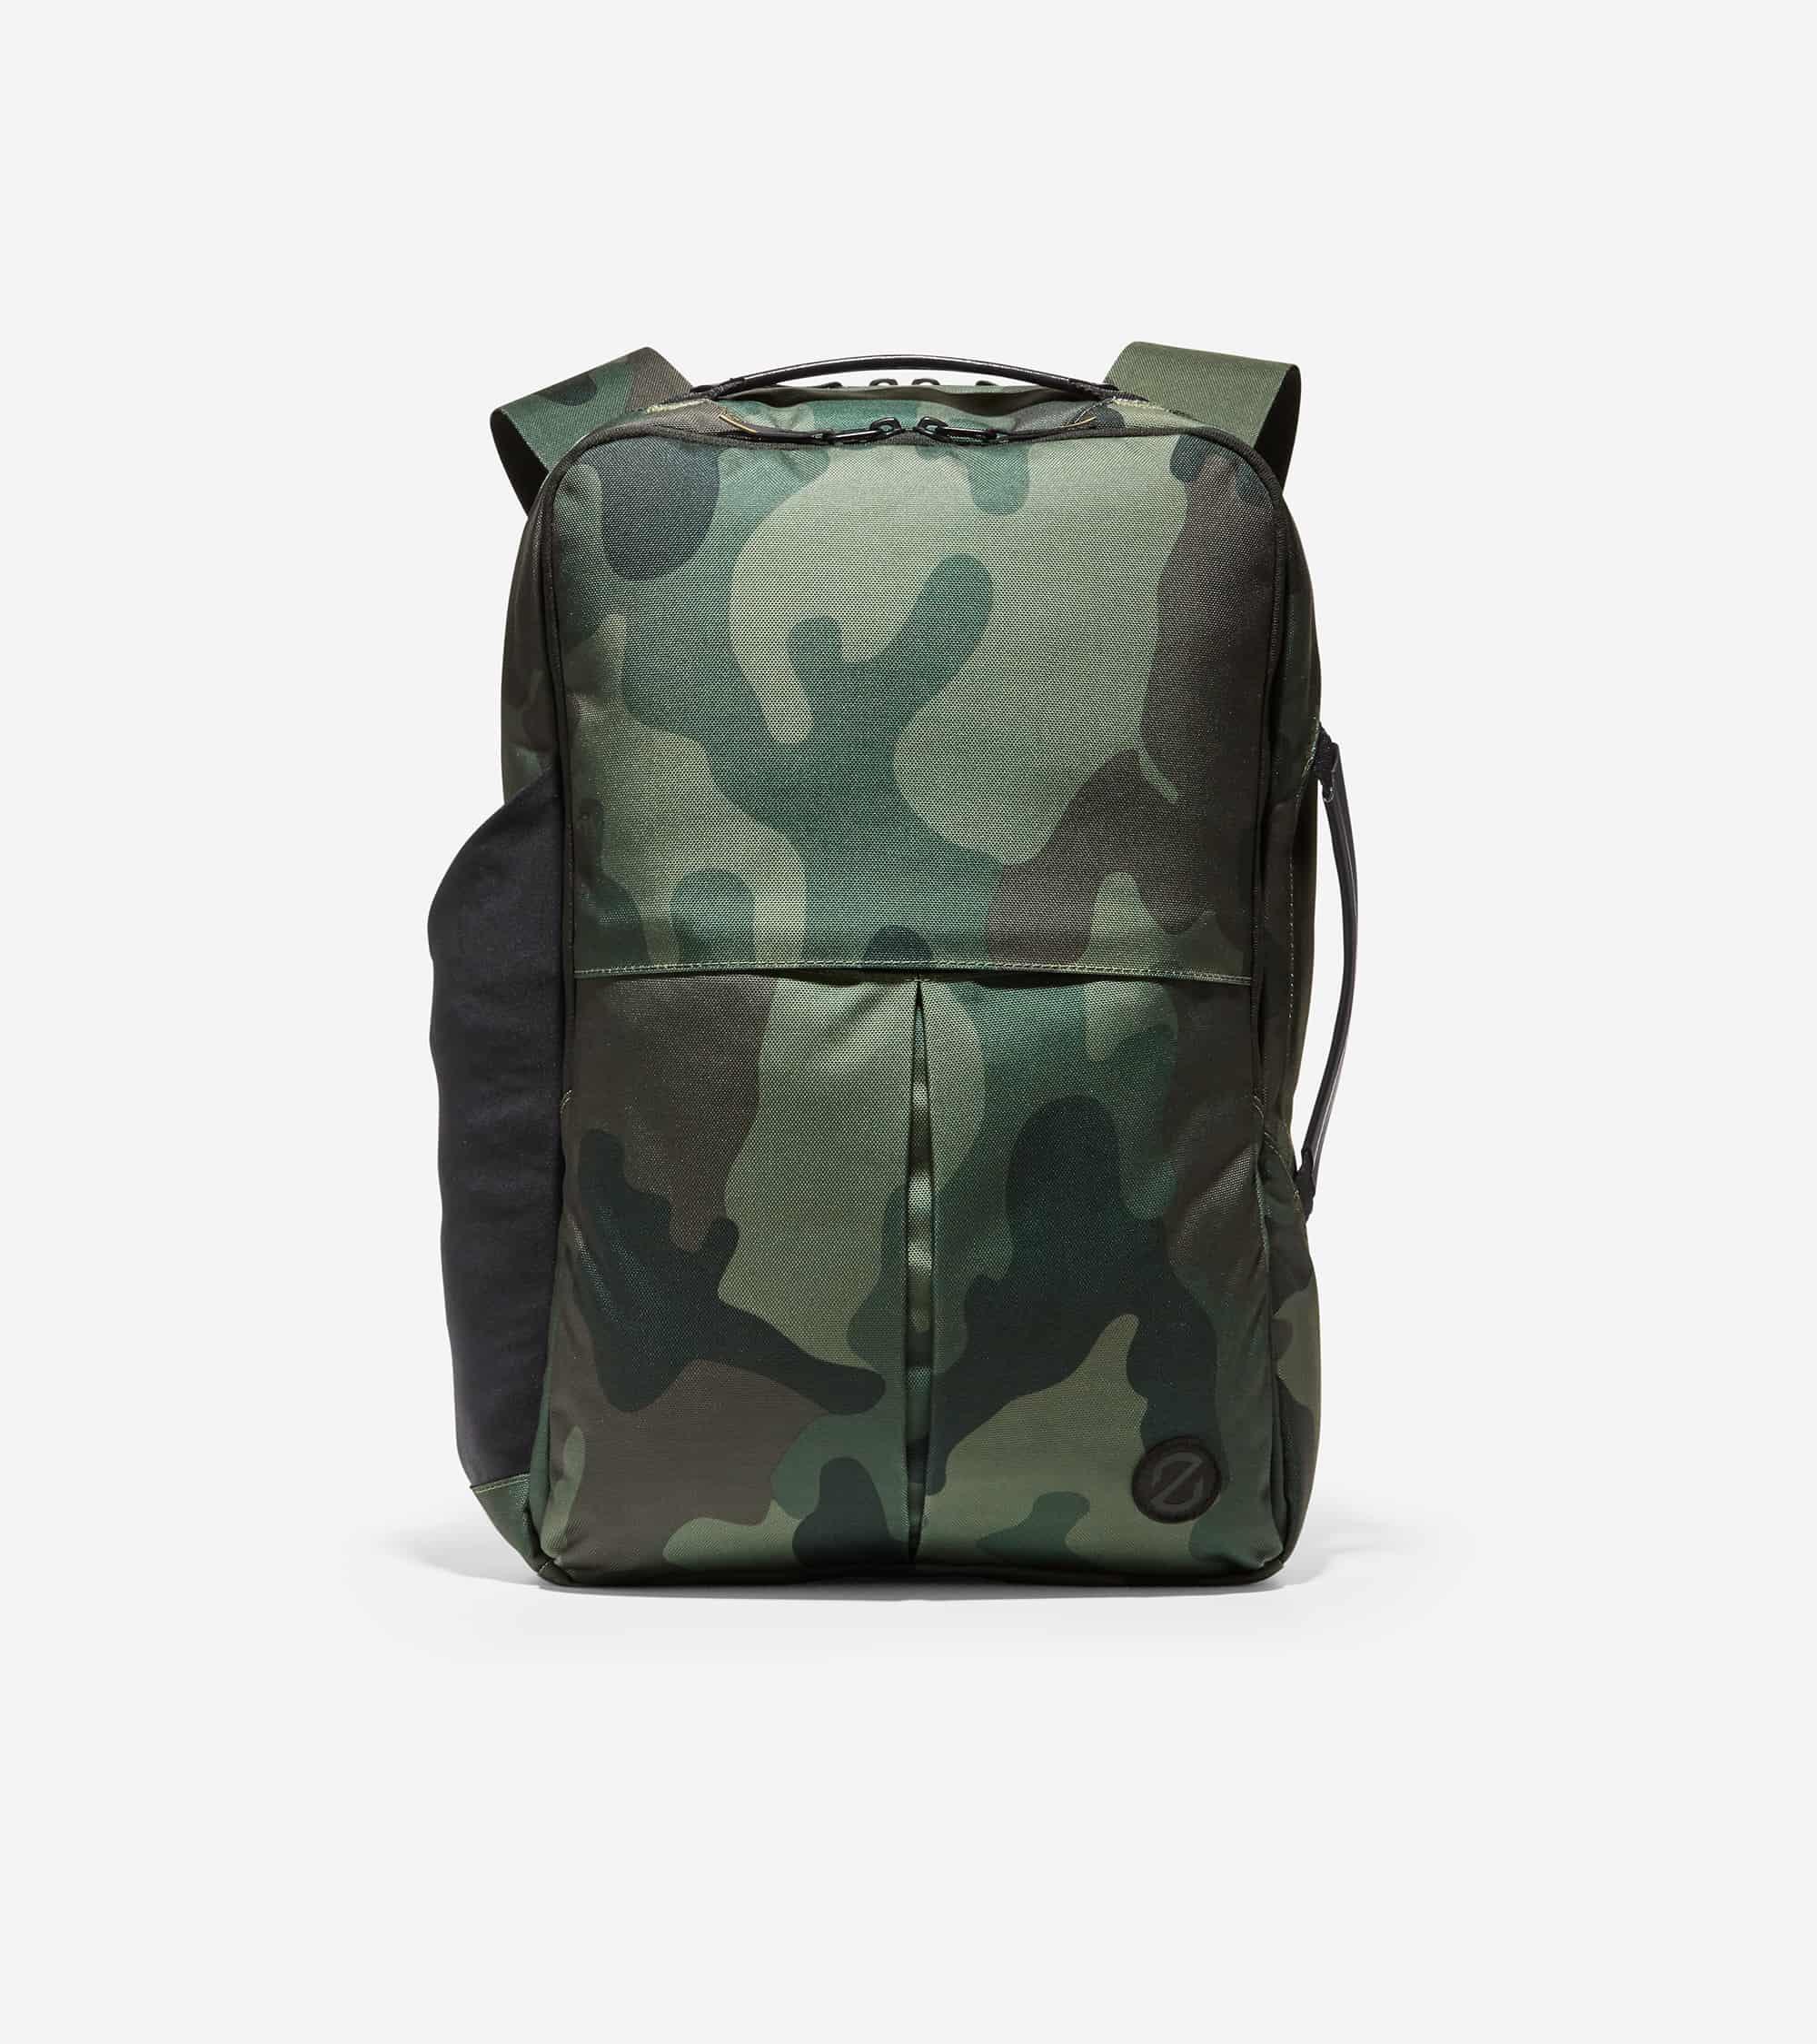 Cole Haan ZERØGRAND Slim Convertible Backpack Black Olive Camo